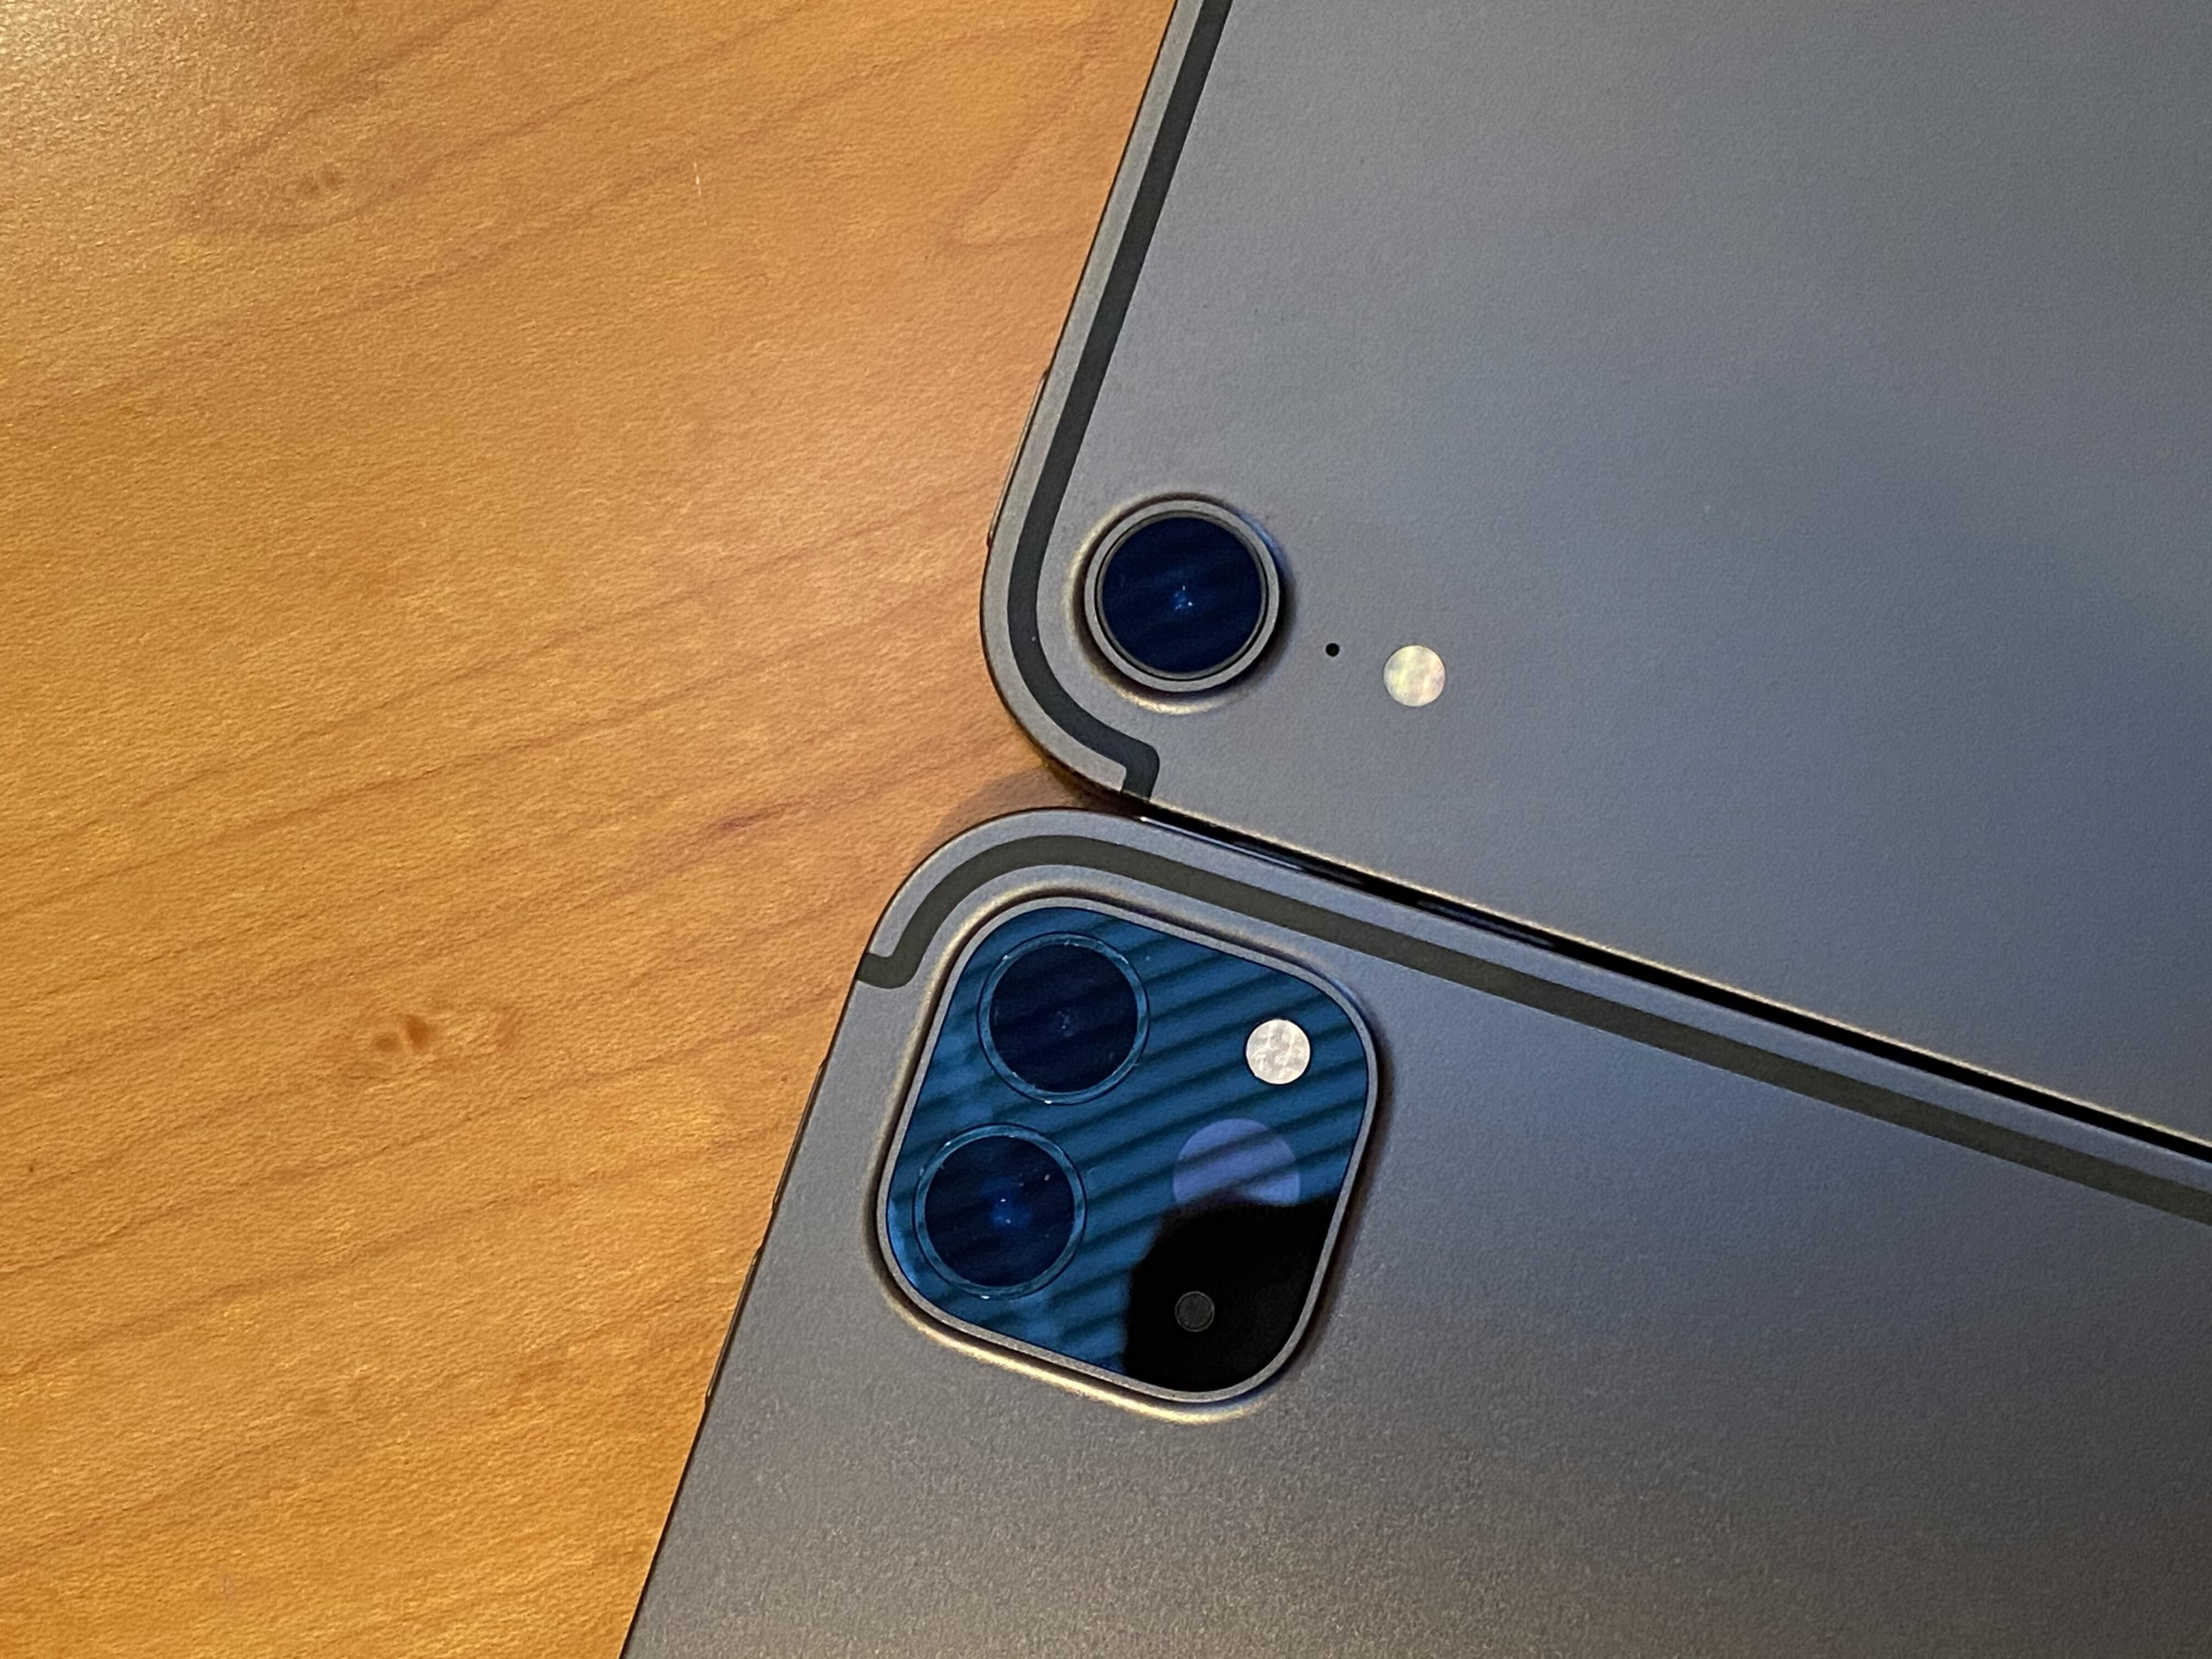 ipadpro-2020-cameracompare